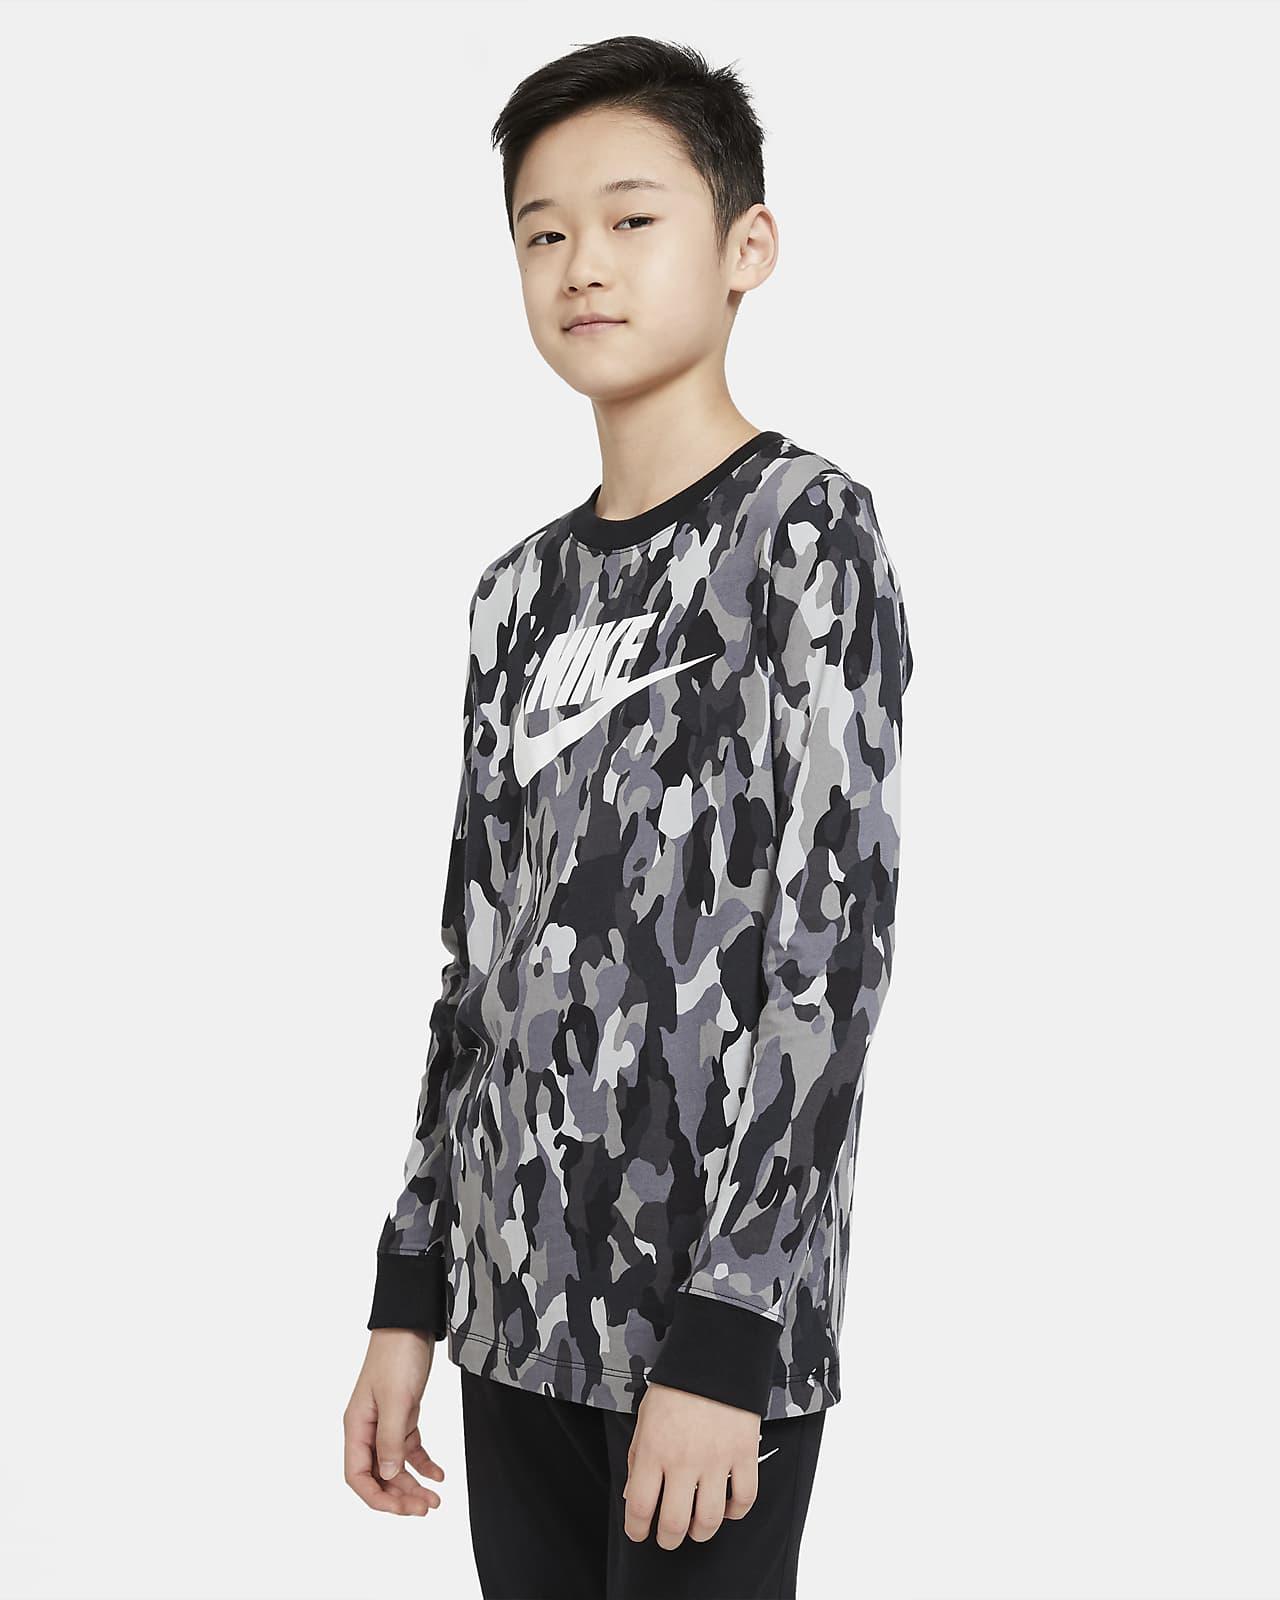 Nike Sportswear Older Kids' (Boys') Printed Long-Sleeve T-Shirt